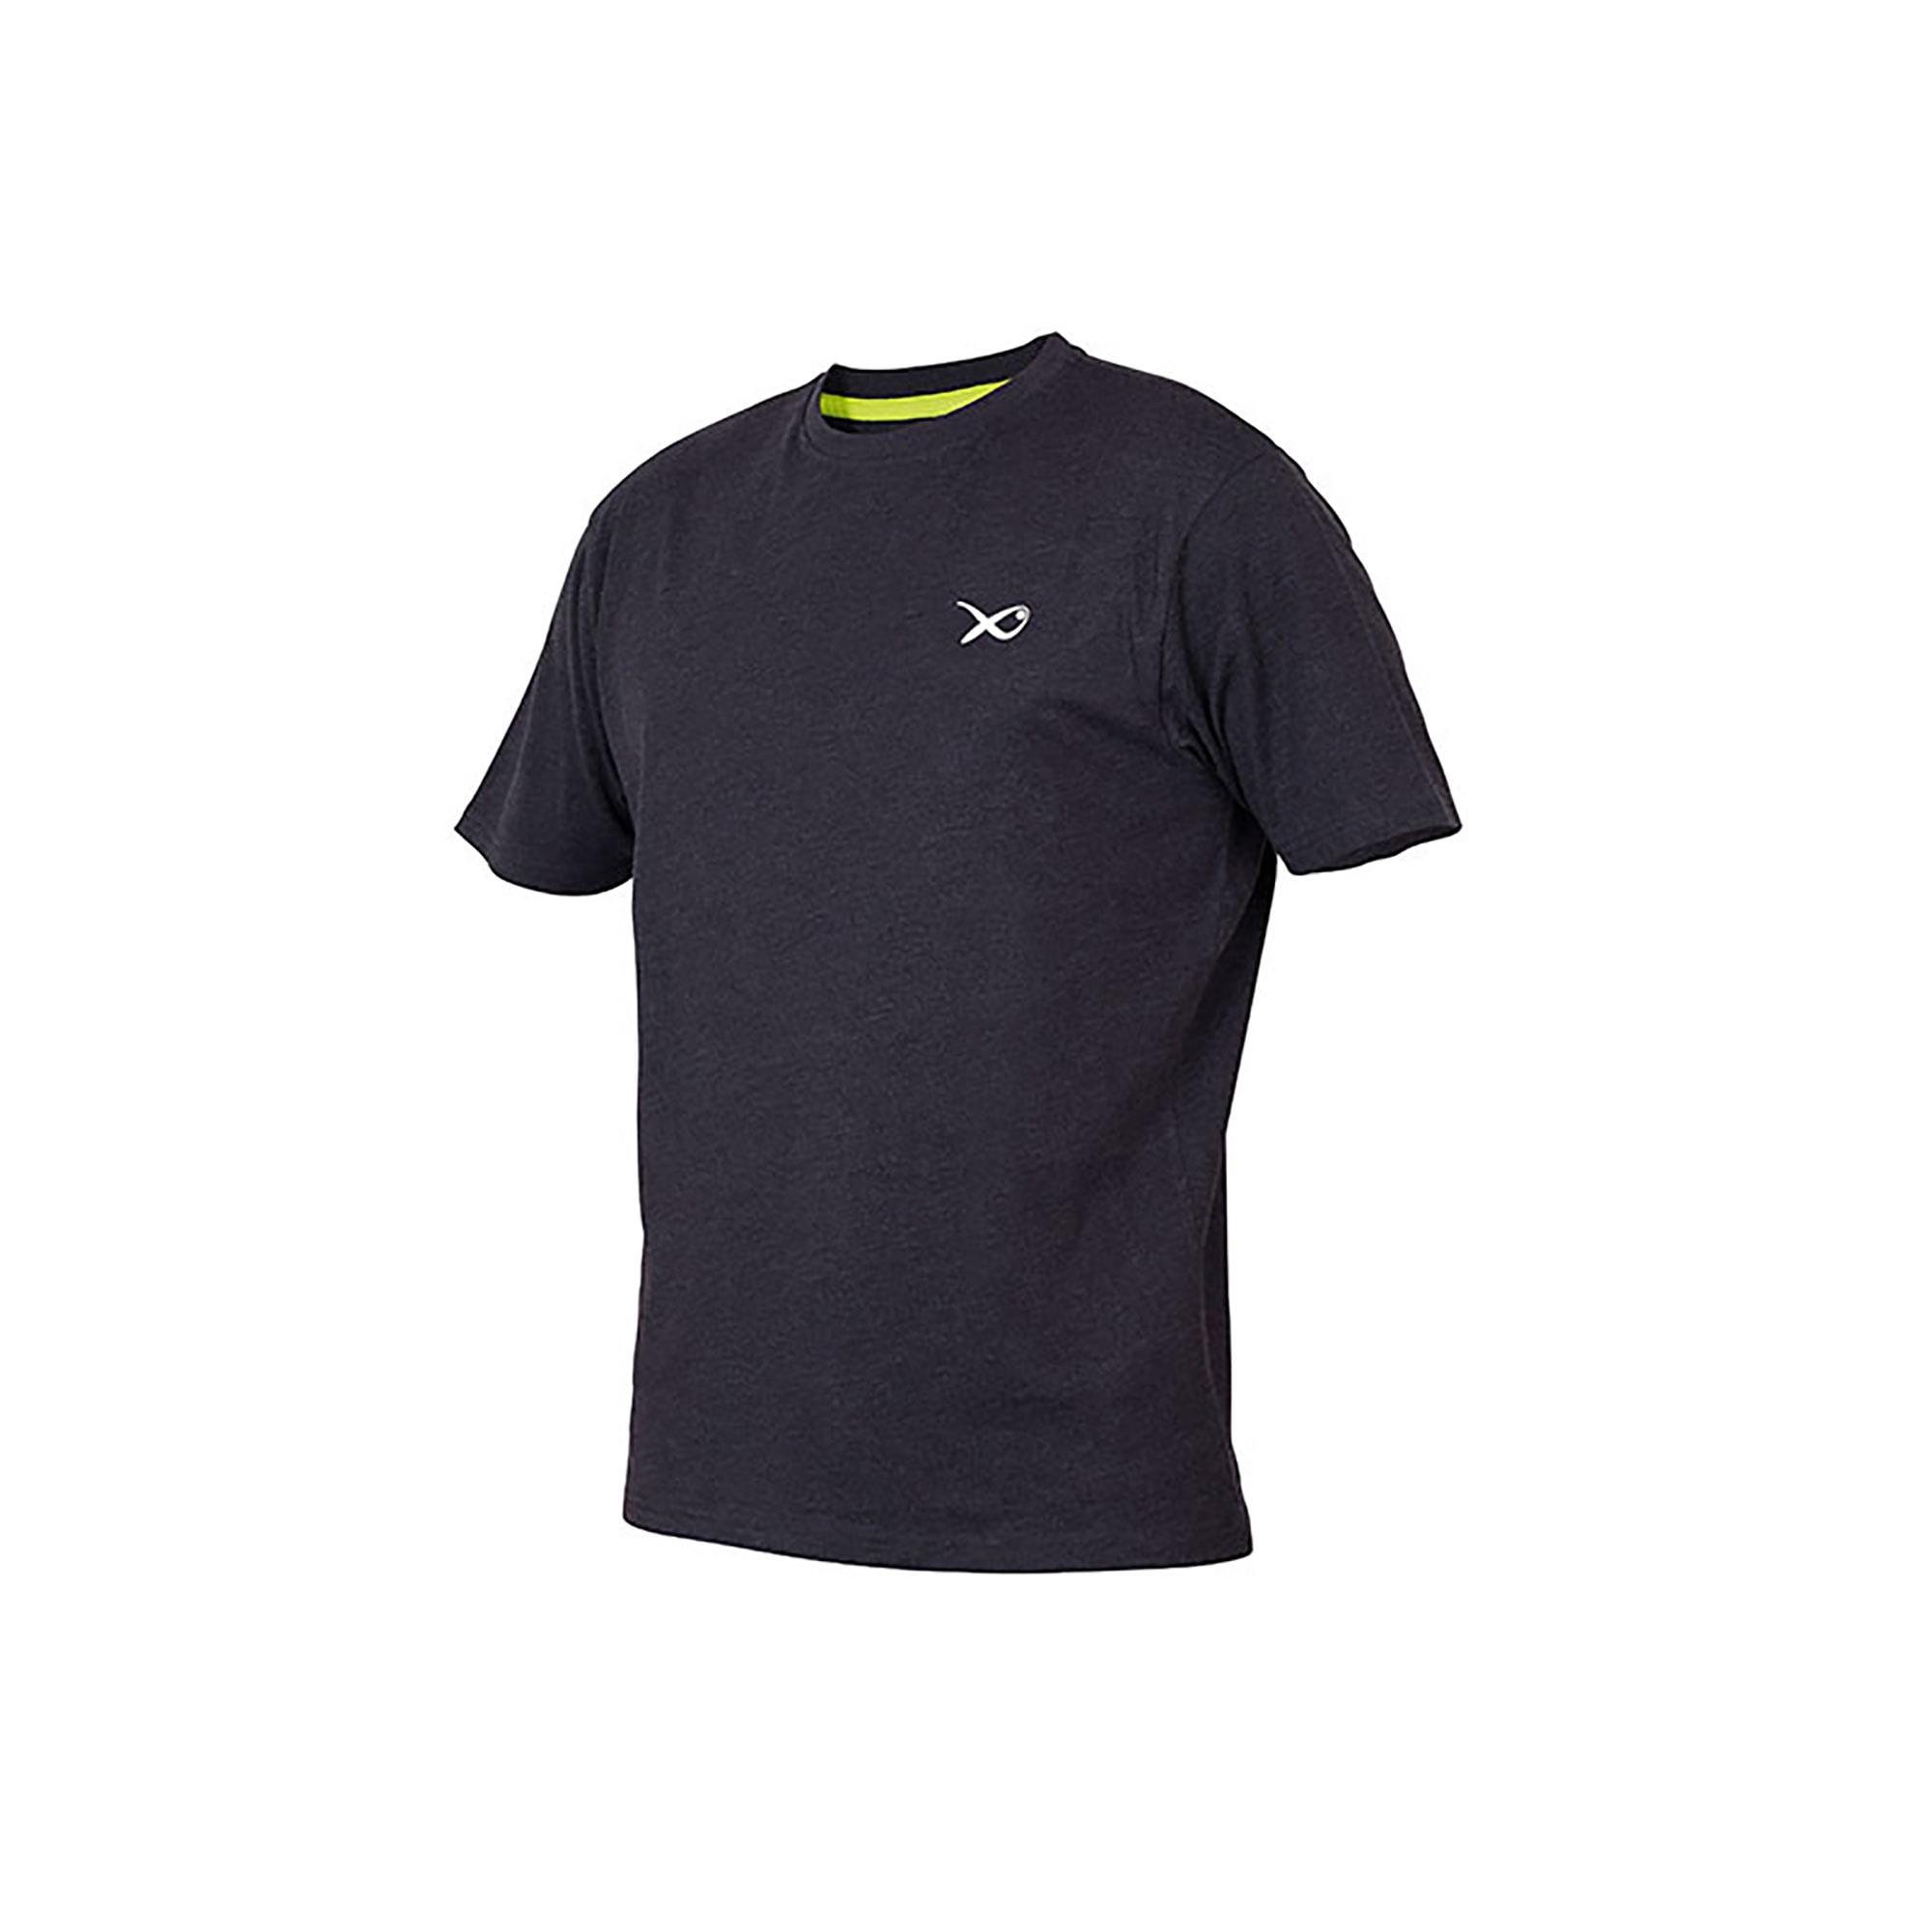 T-shirt Black MATRIX